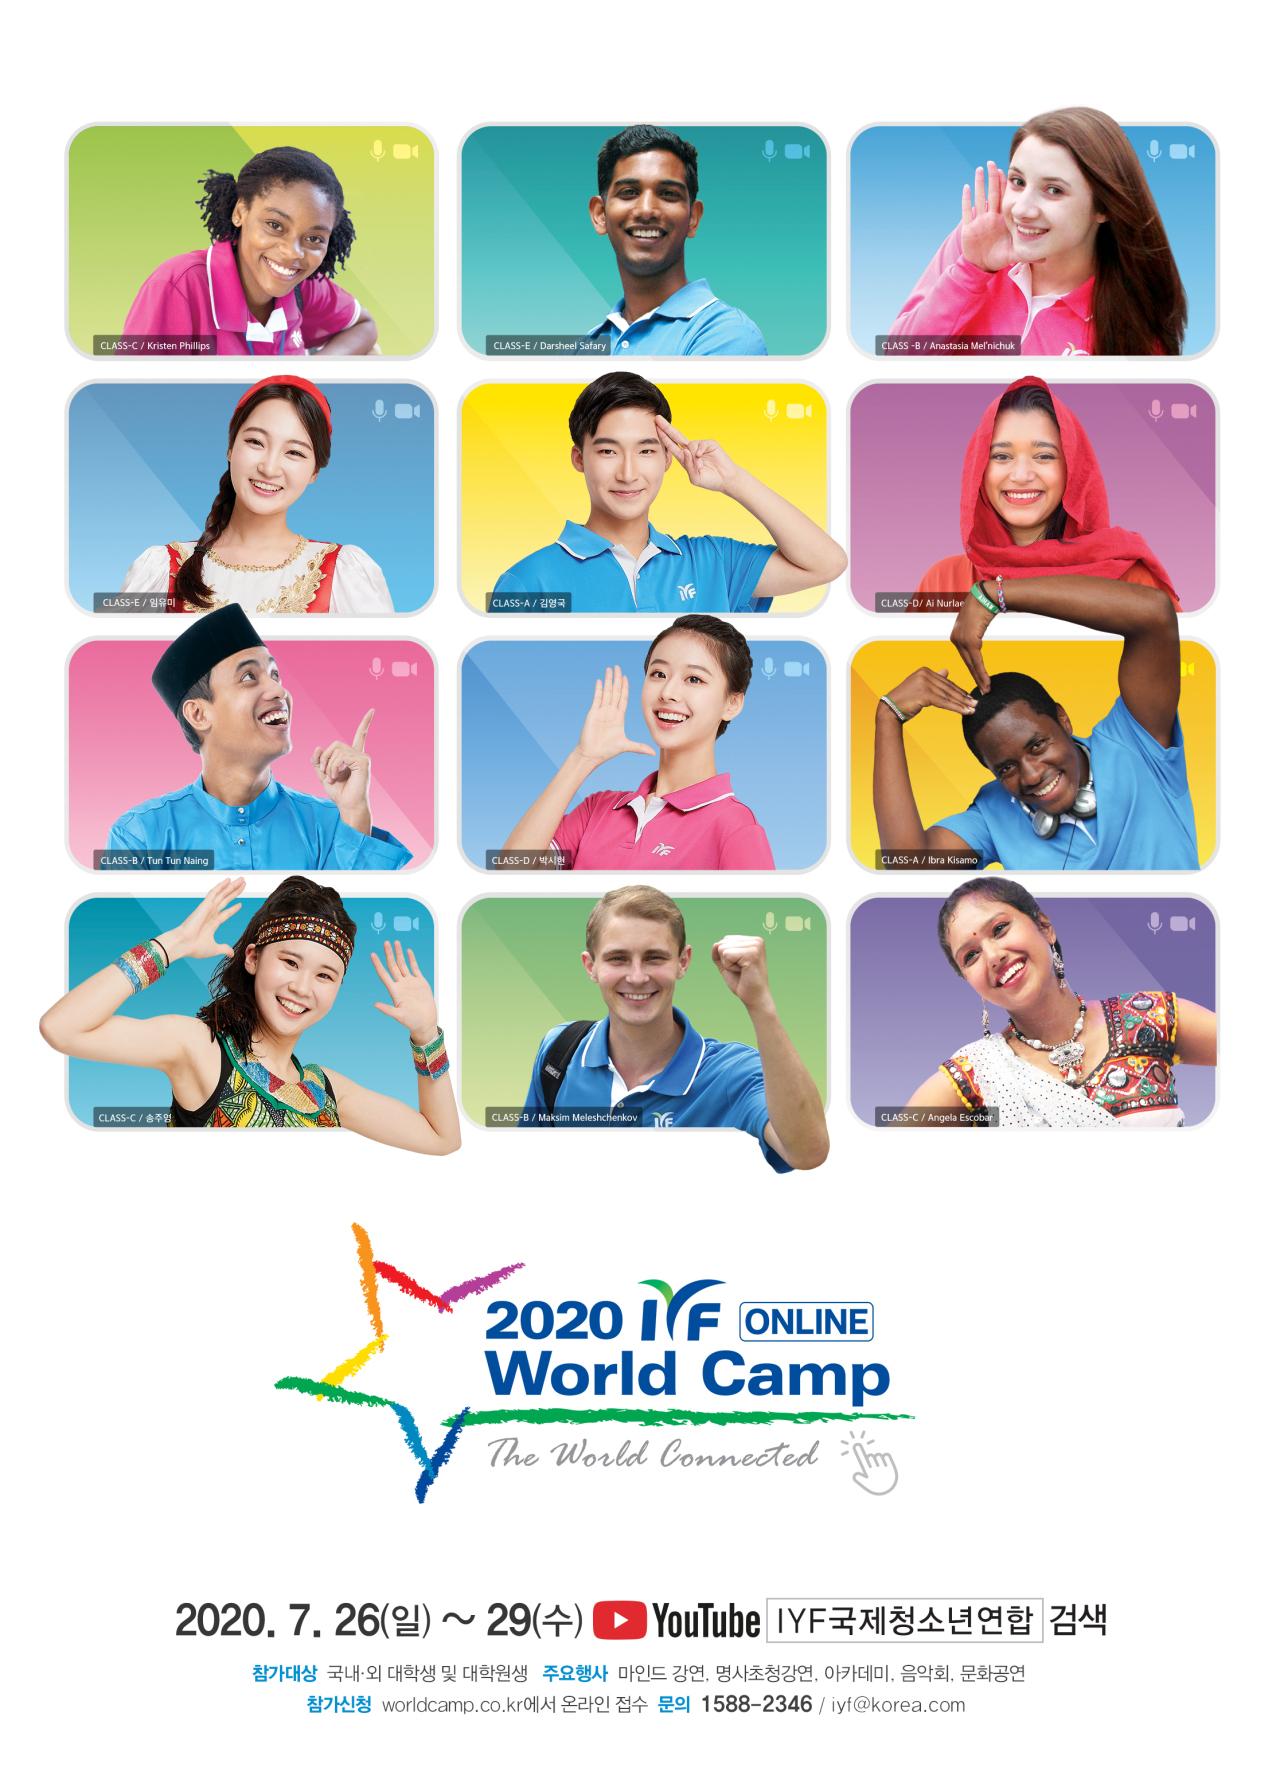 2020 IYF Onine World Camp poster. (IYF)